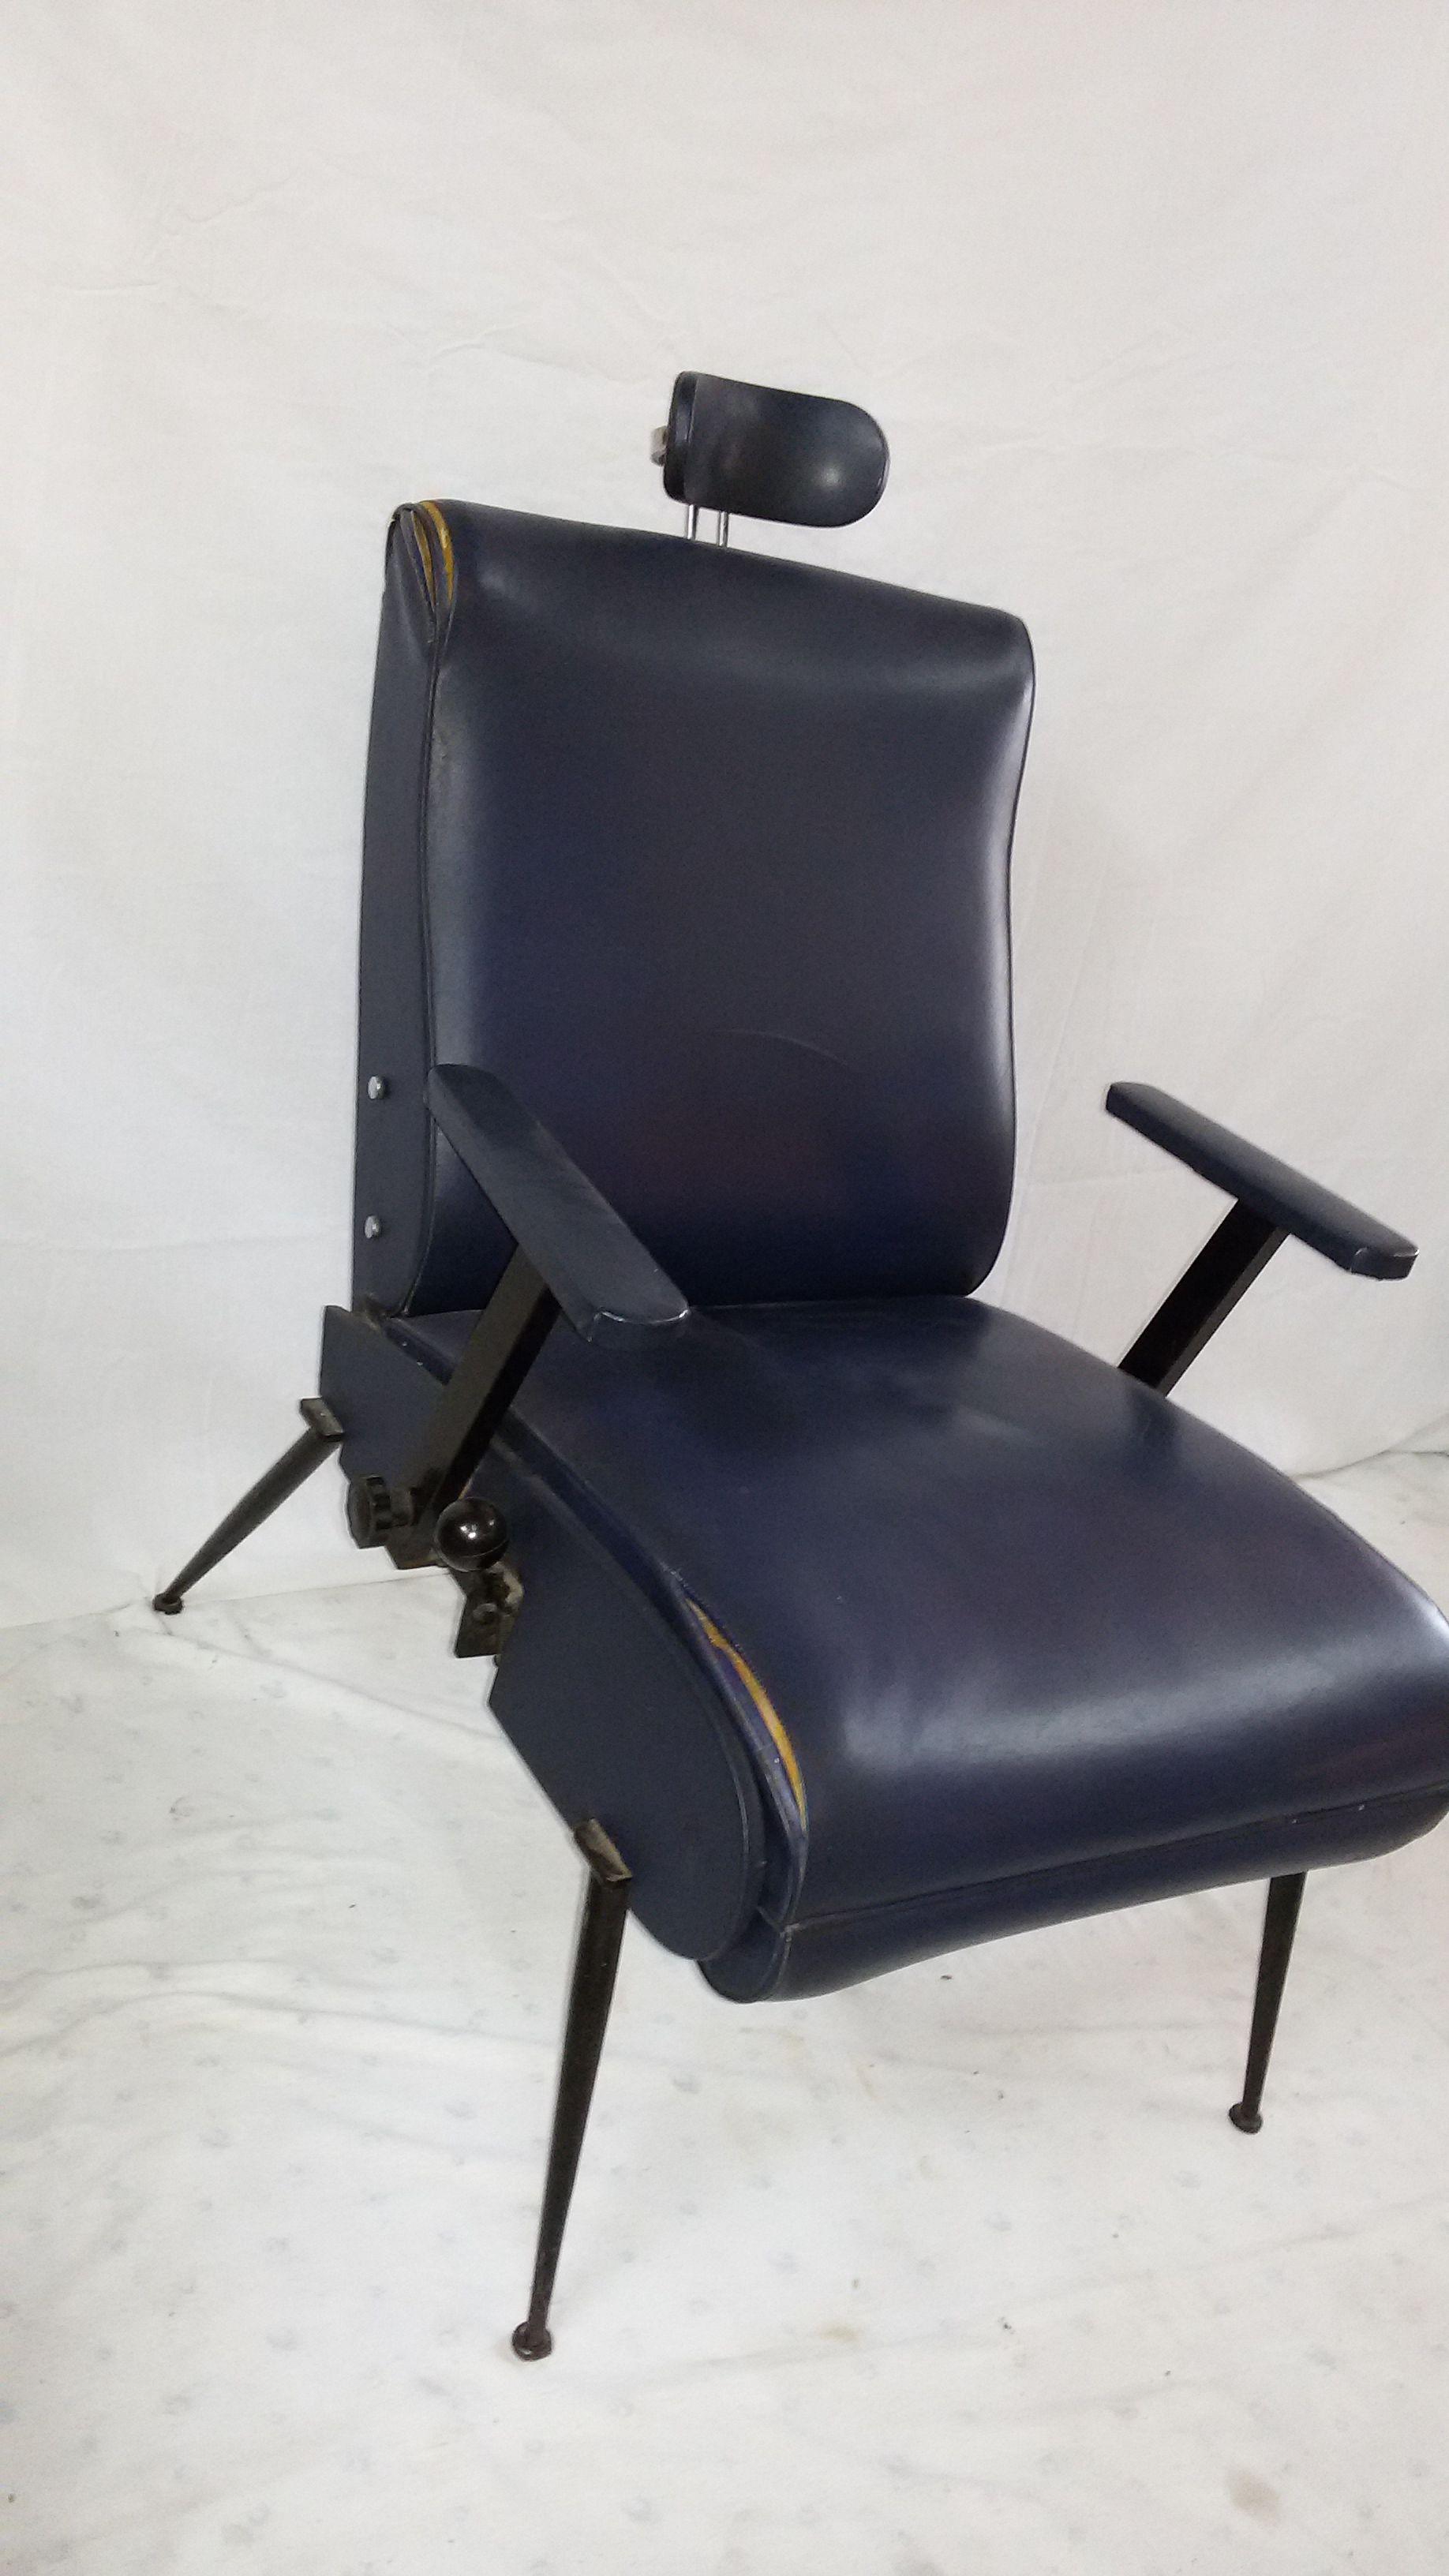 Sedie Reclinabili ~ Poltrona armchair reclinabile modernariato design style tecno